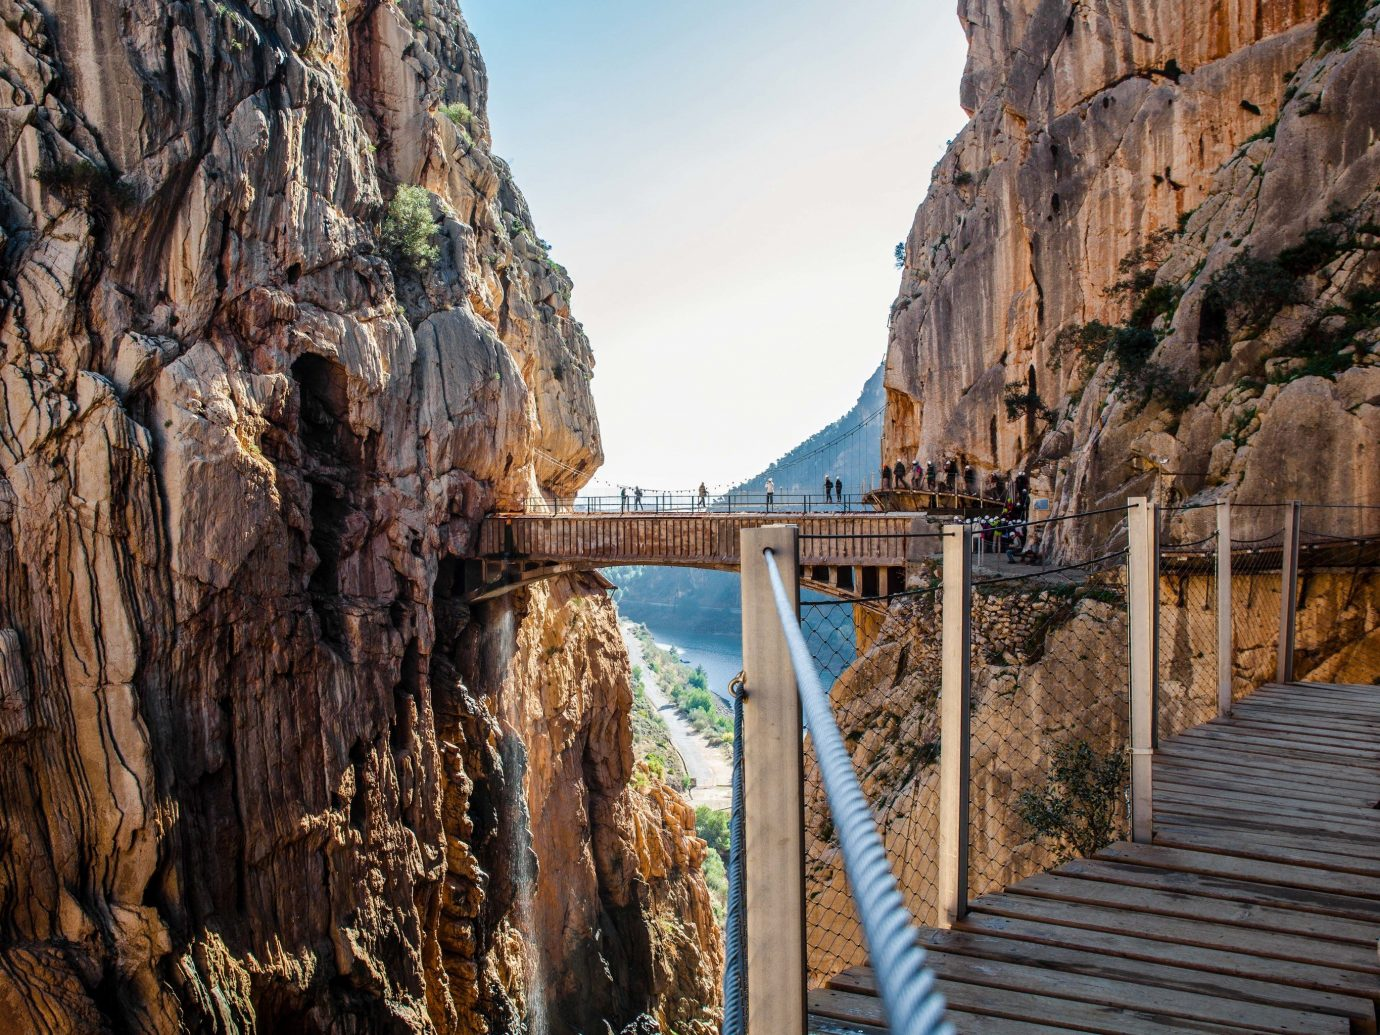 europe Outdoors + Adventure Trip Ideas rock canyon national park formation cliff terrain sky escarpment tourist attraction tree mountain wadi geology tourism landscape